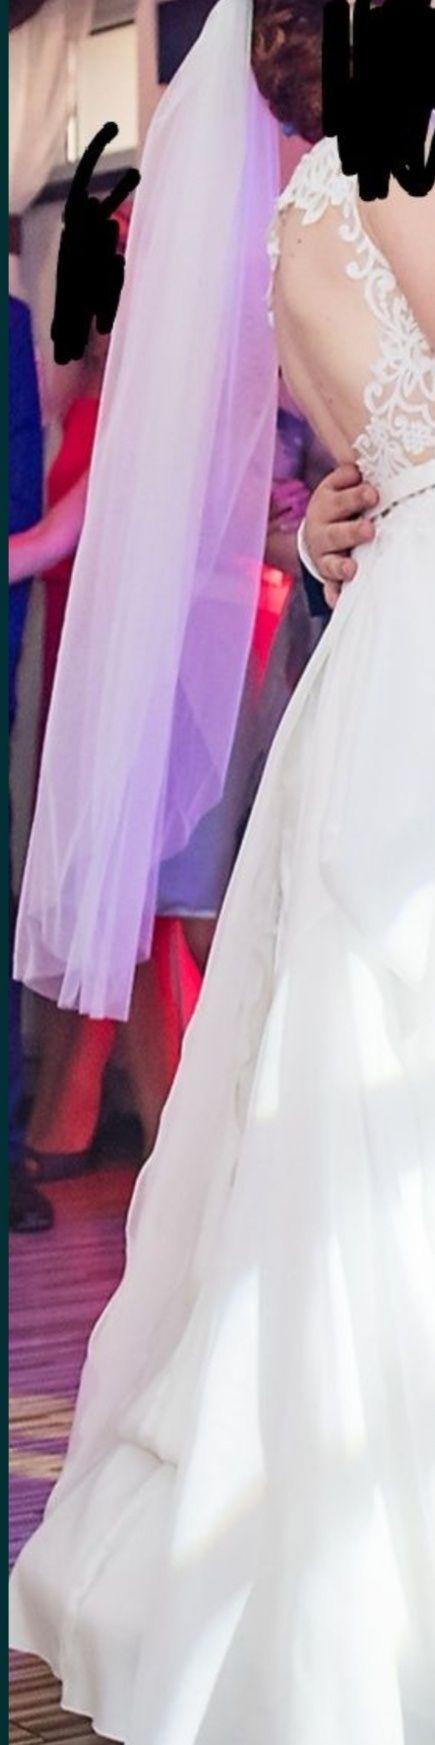 Welon ślub suknia ślubna